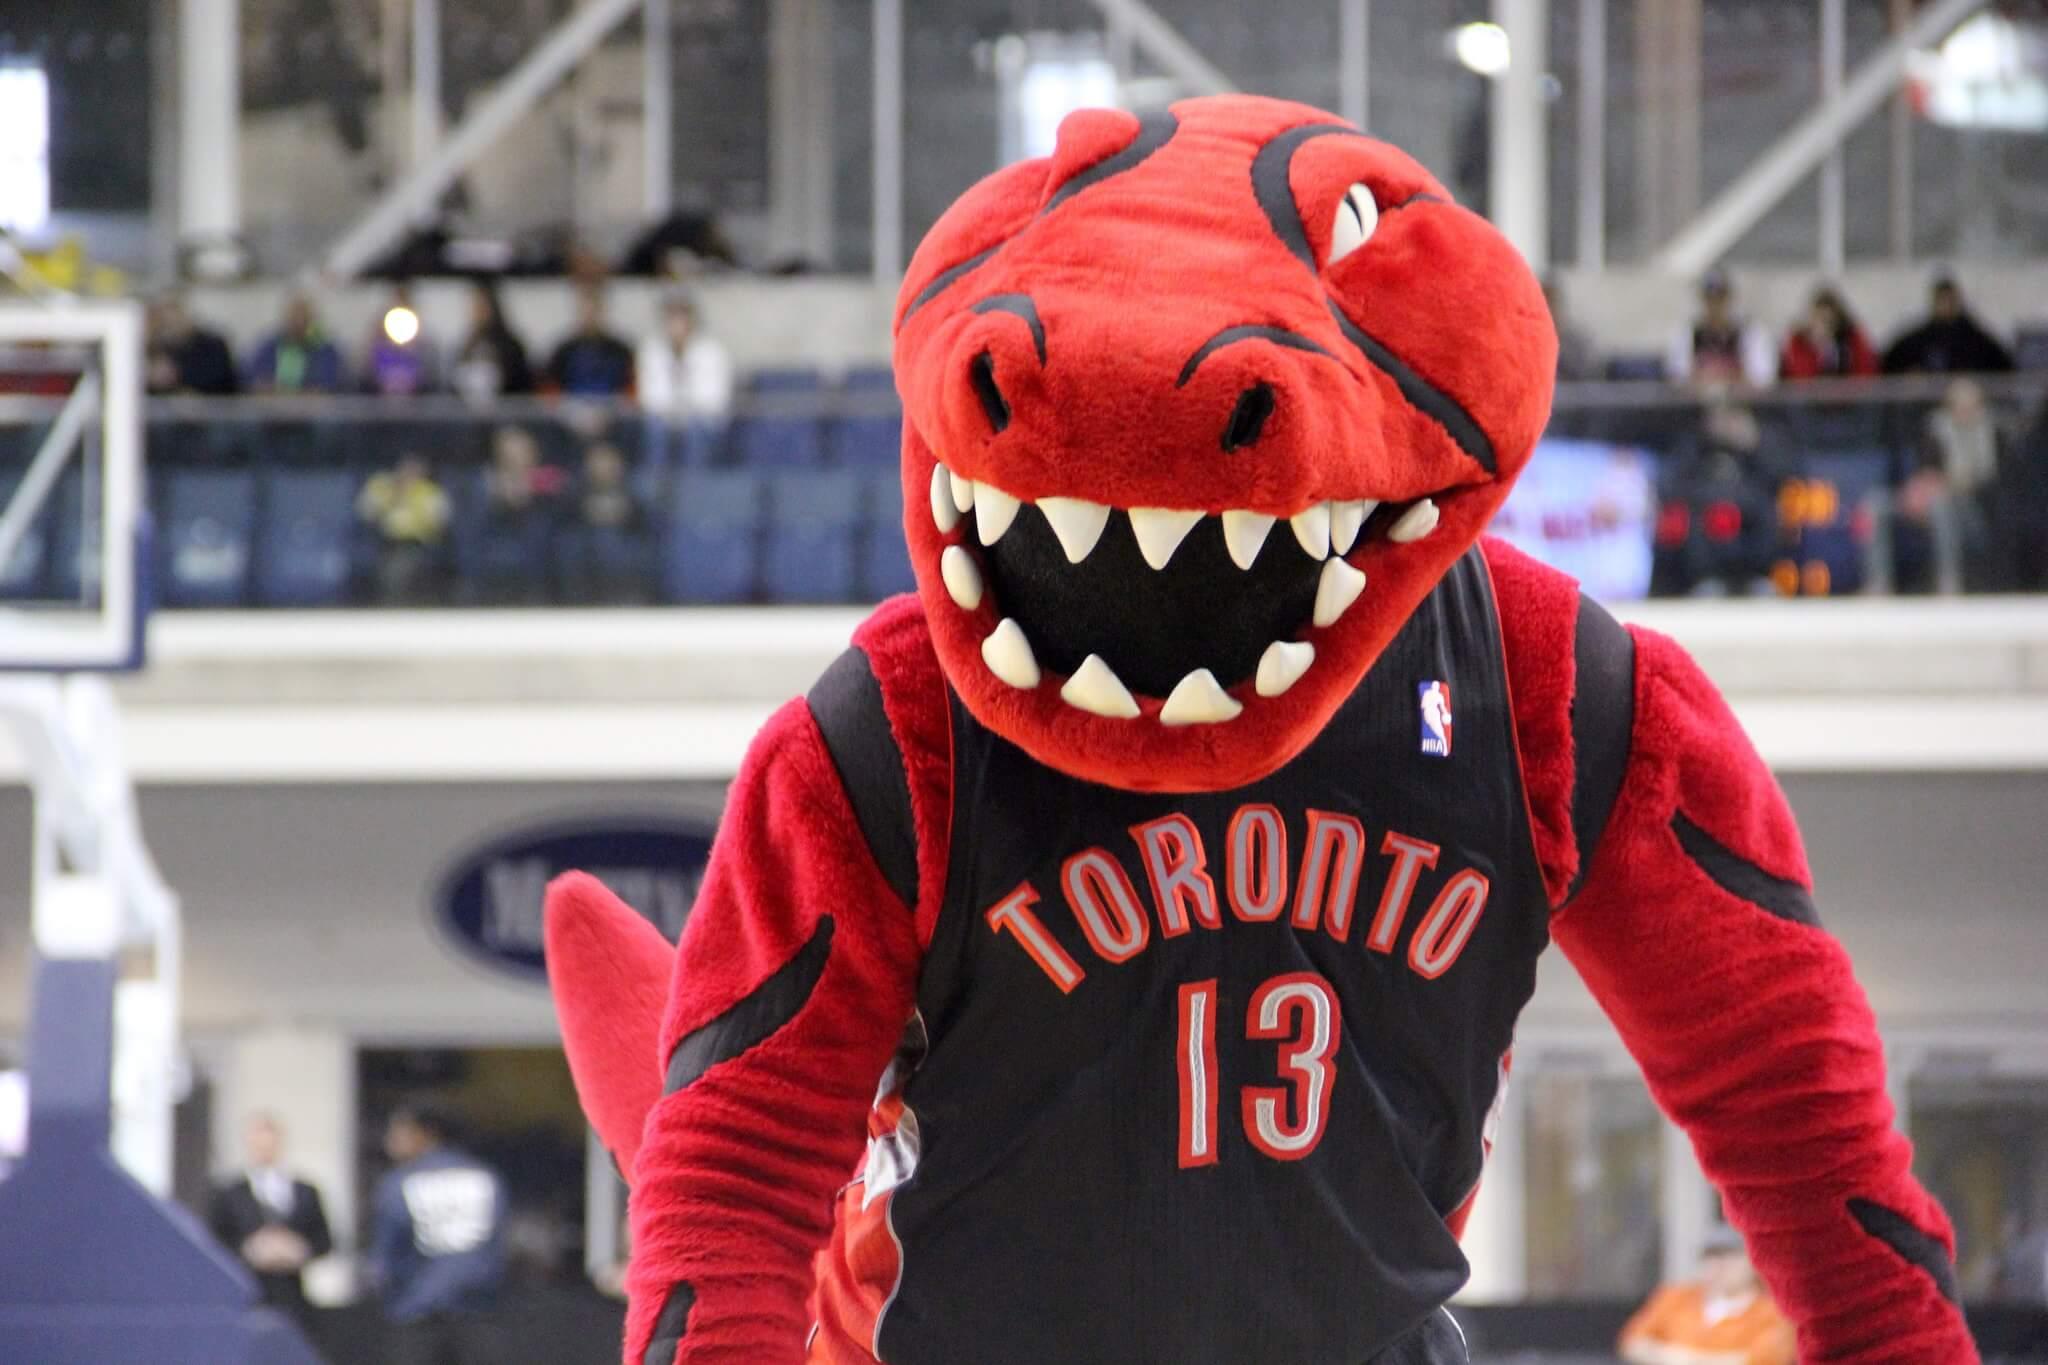 Raptor Toronto Raptors mascot